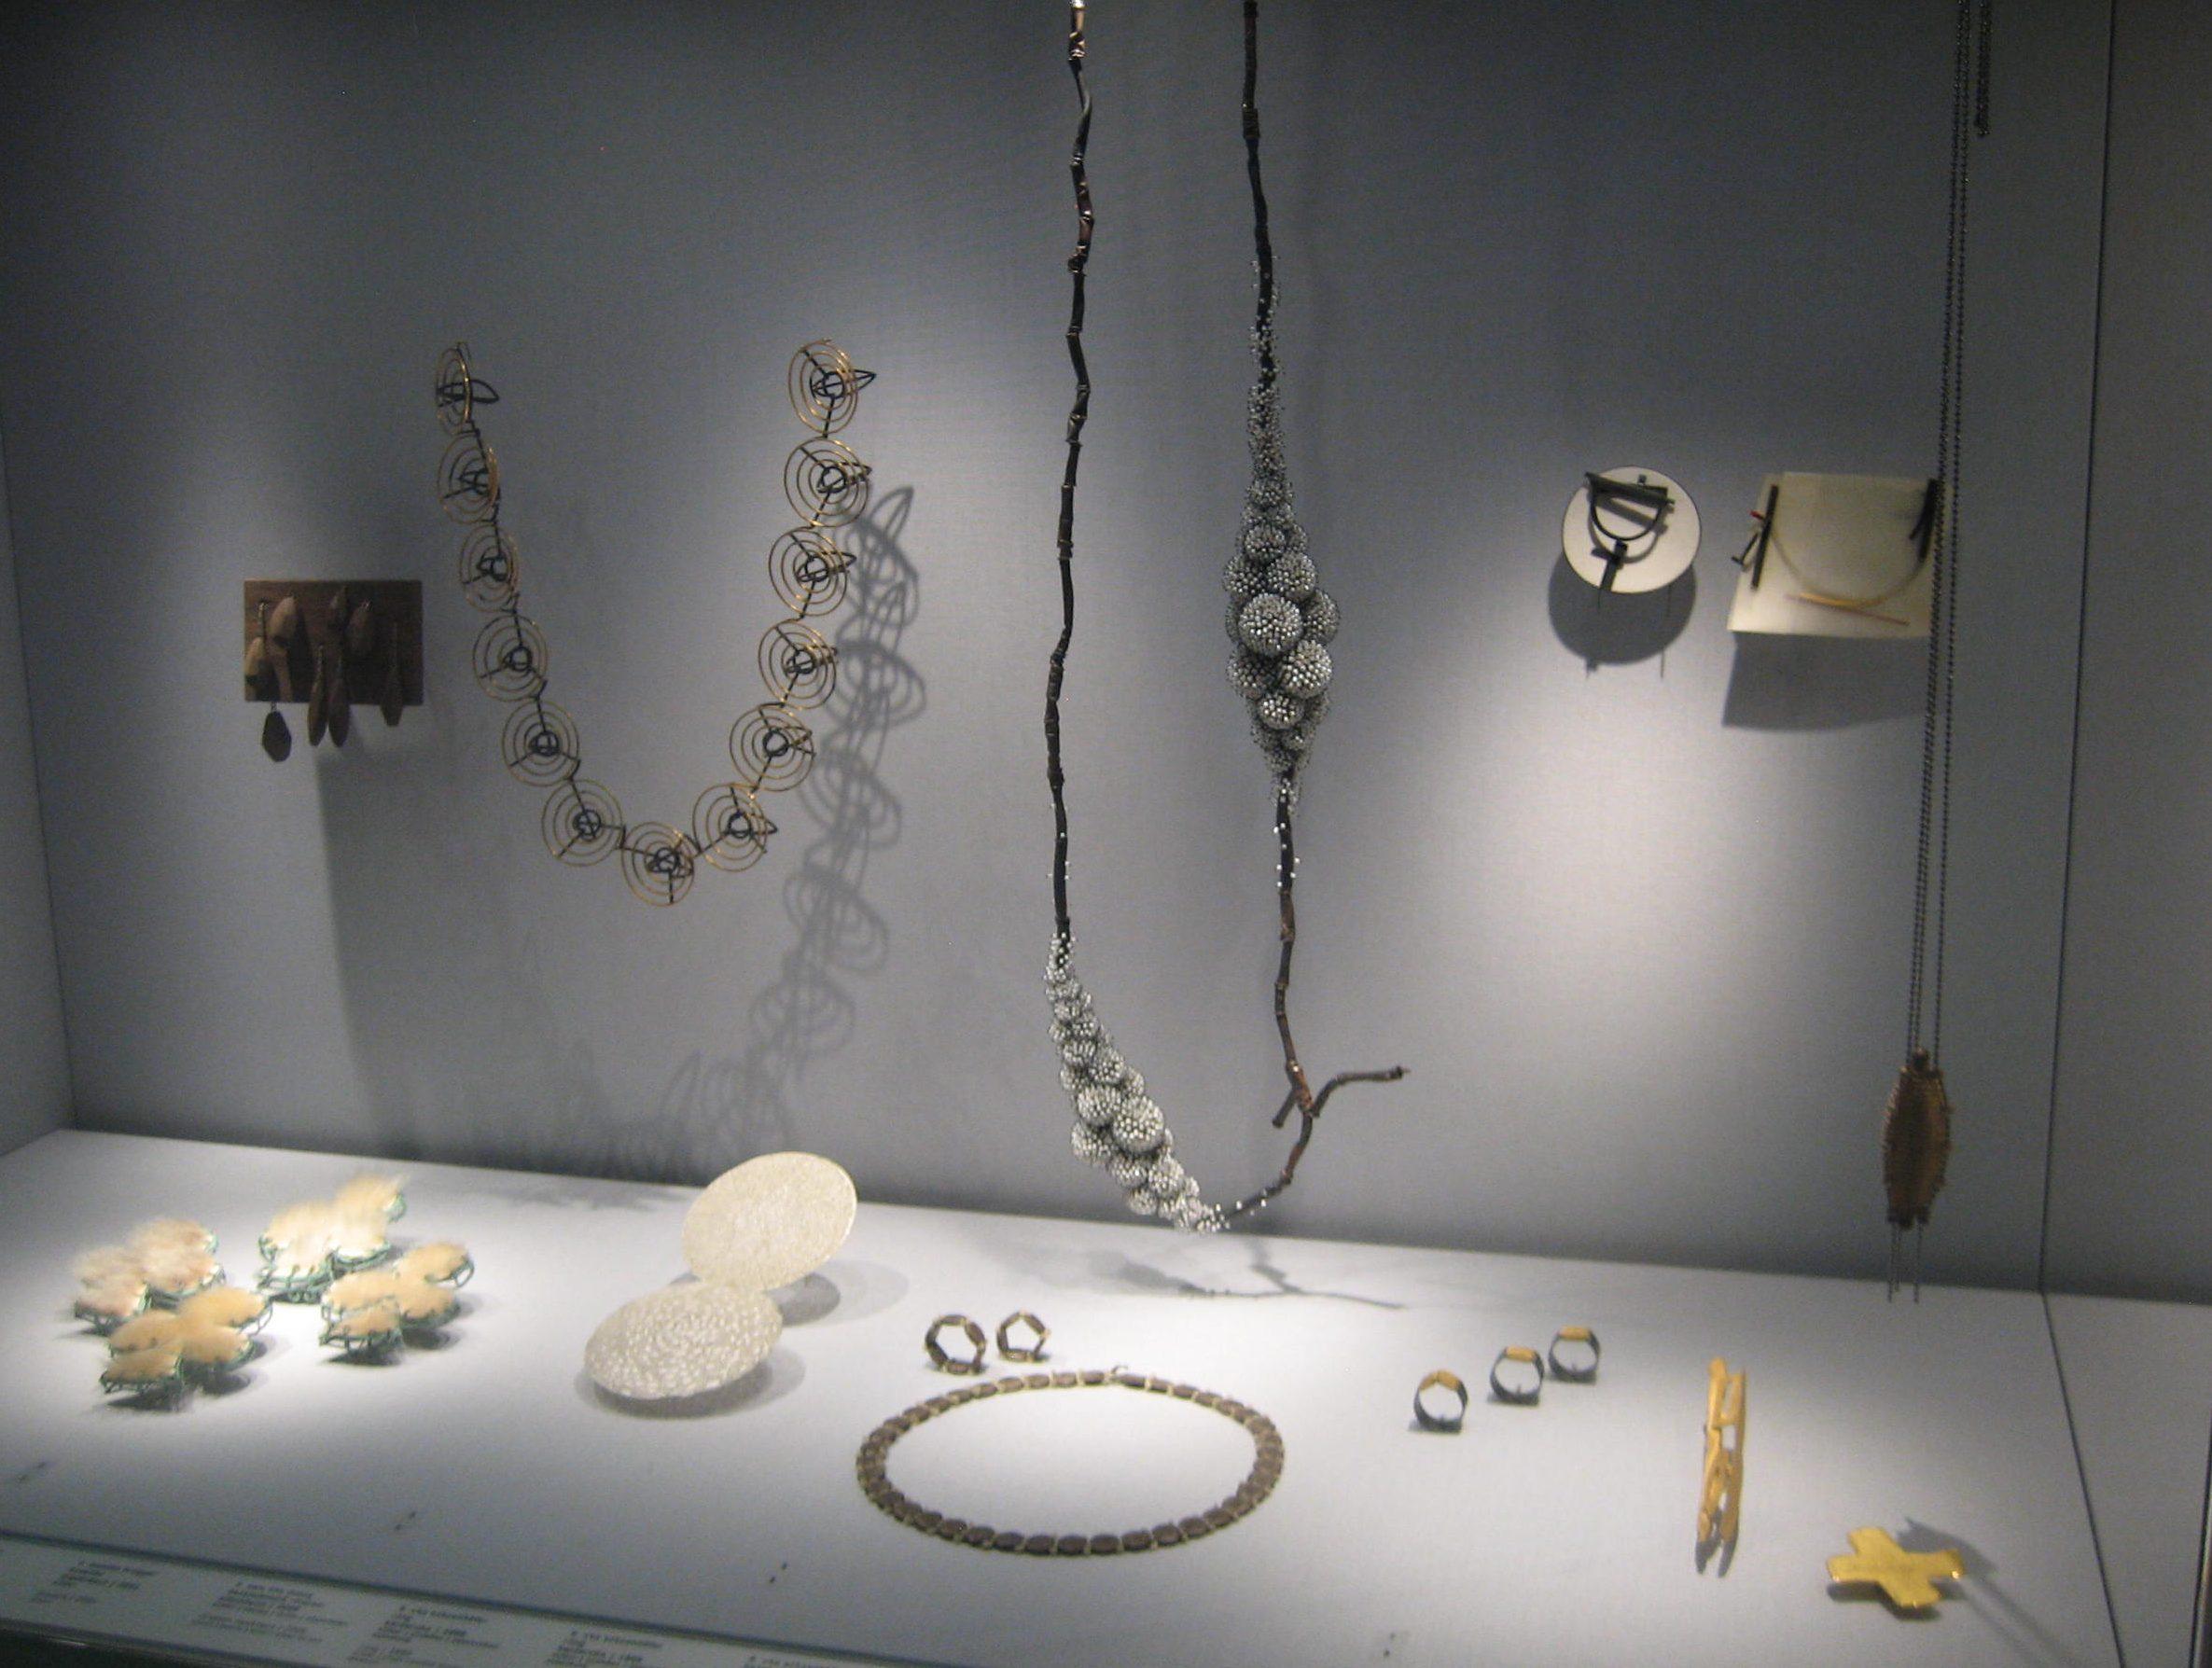 Collectie Schmuckmuseum Pforzheim. Foto Coert Peter Krabbe, mei 2019, vitrine, Rian de Jong, Monika Brügger, Ute Eitzenhöfer, Sam-Tho Duong, parel, bont, textiel, zilver